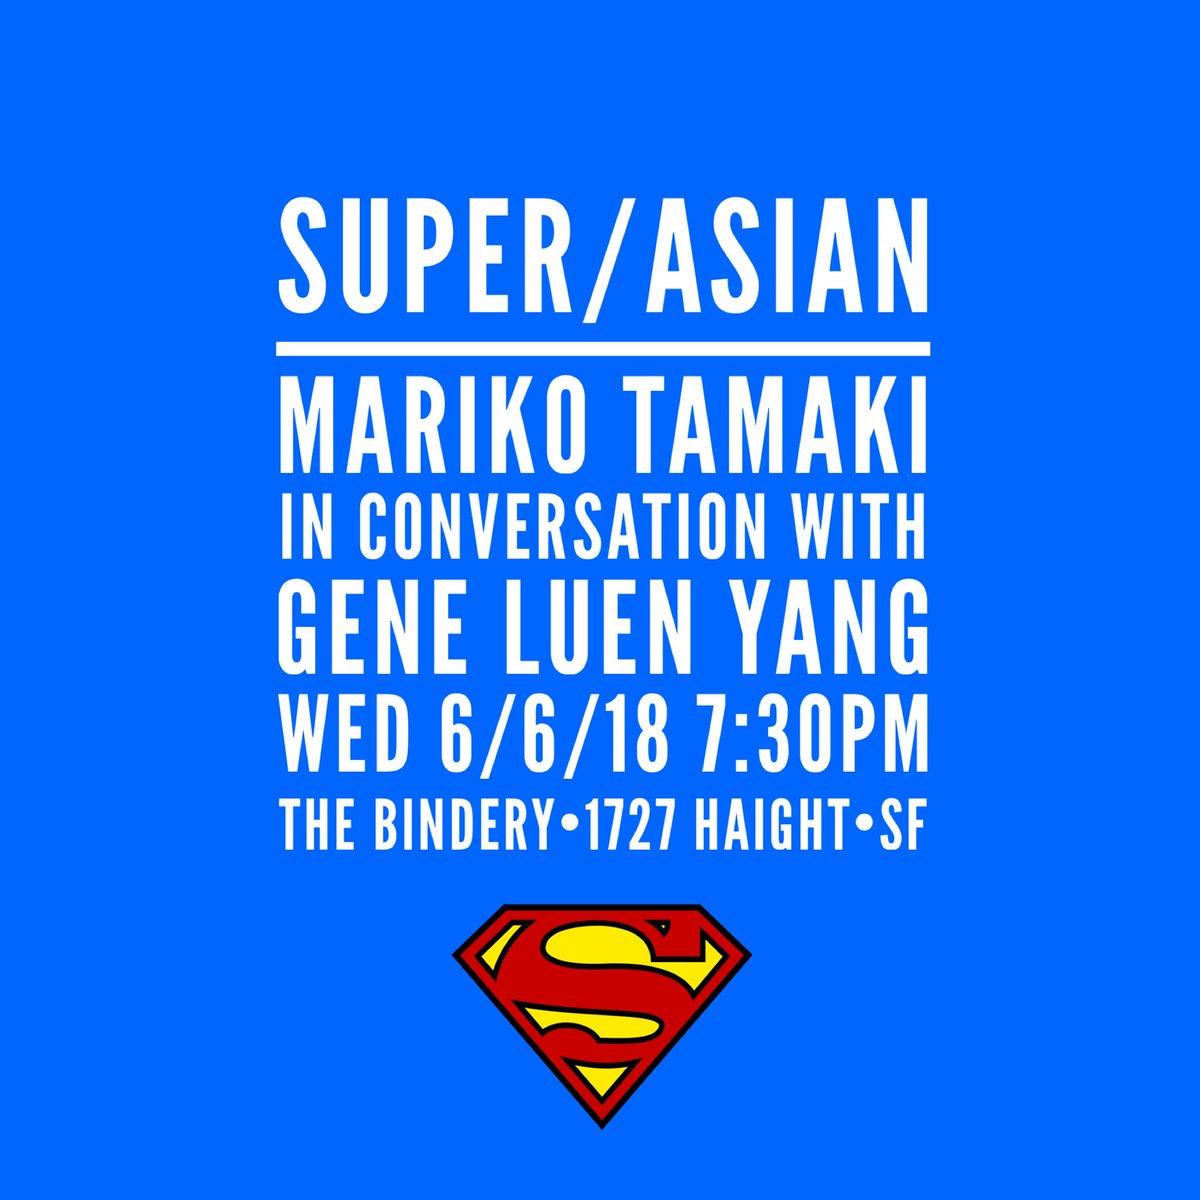 SUPER / ASIAN